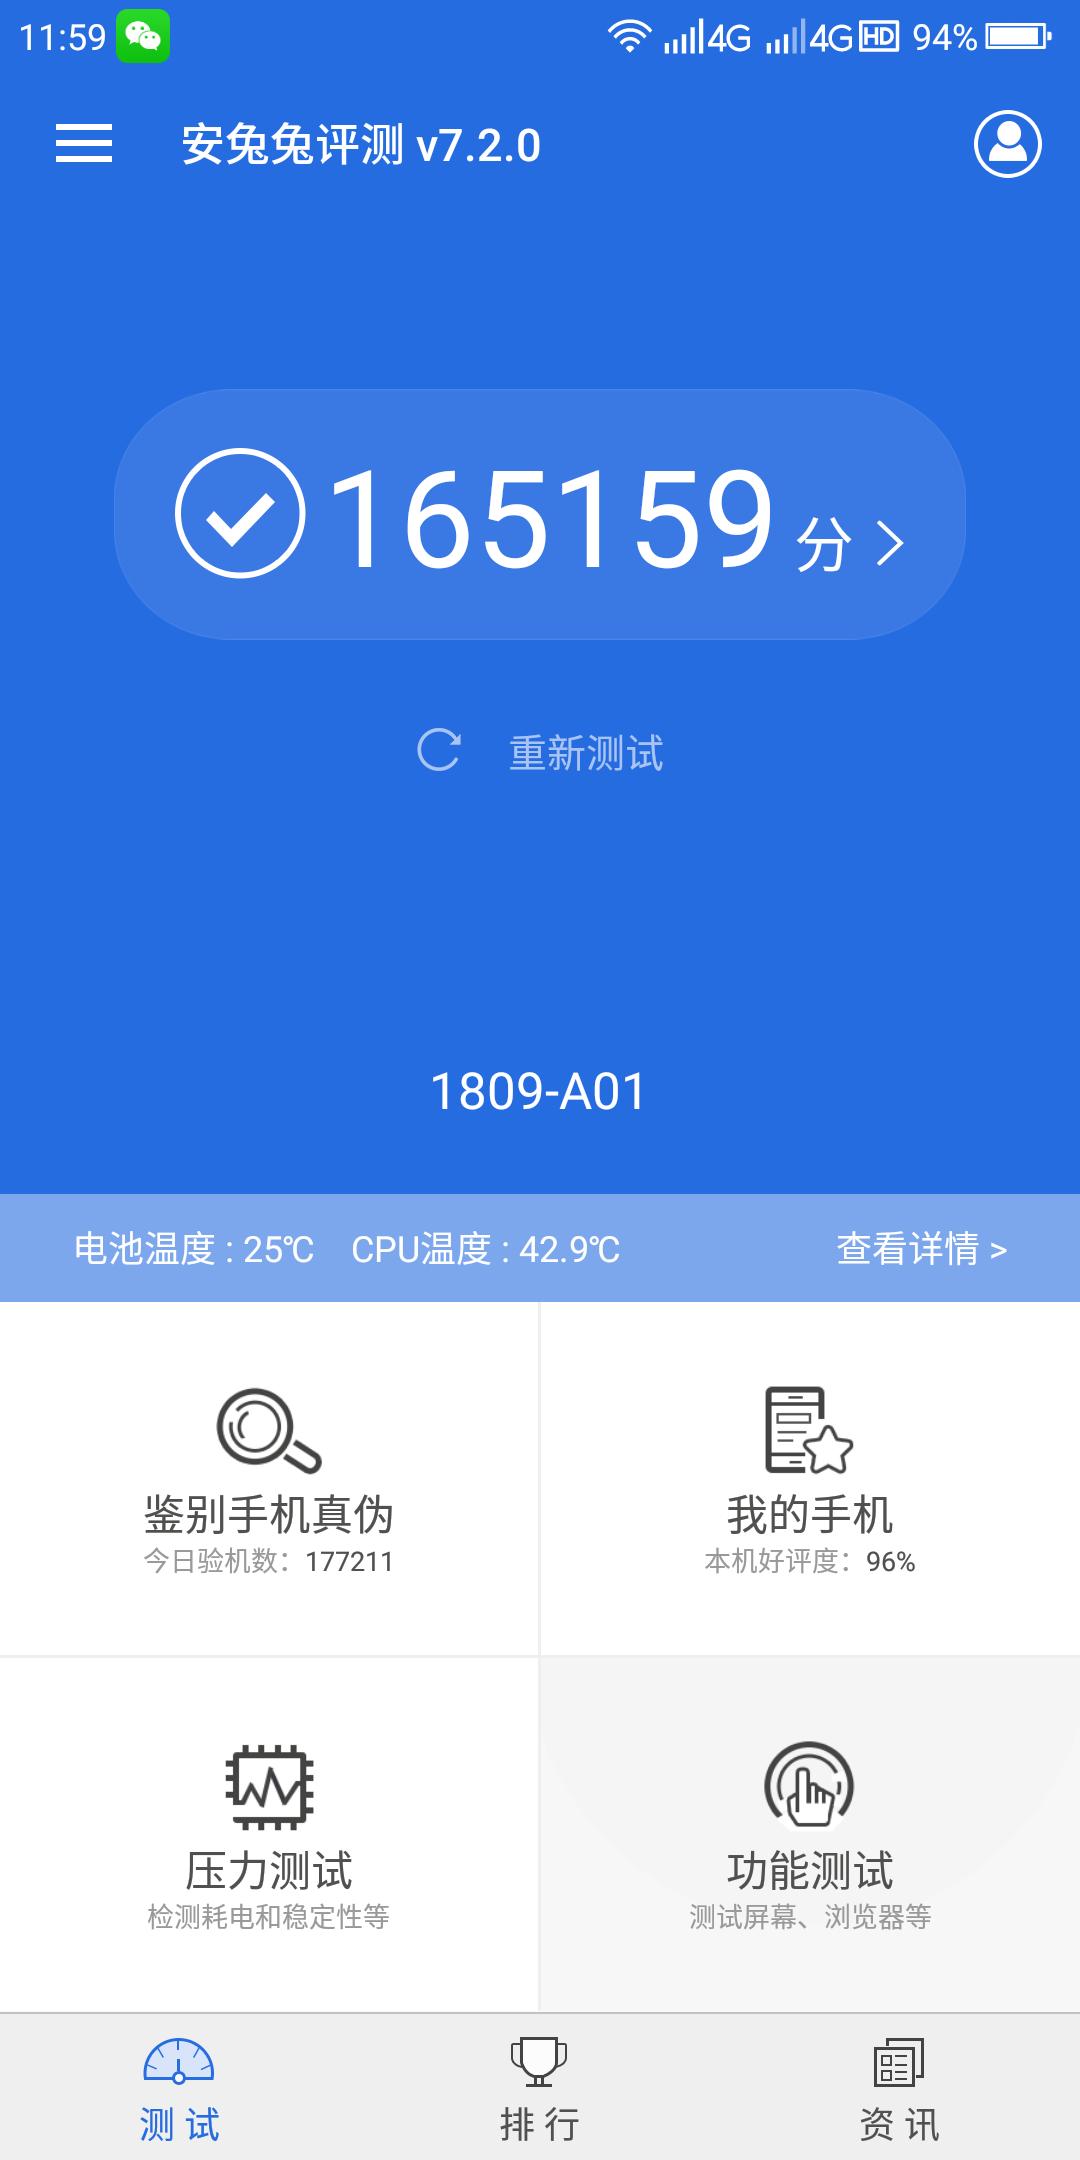 Screenshot_2018-12-10-11-59-20.png